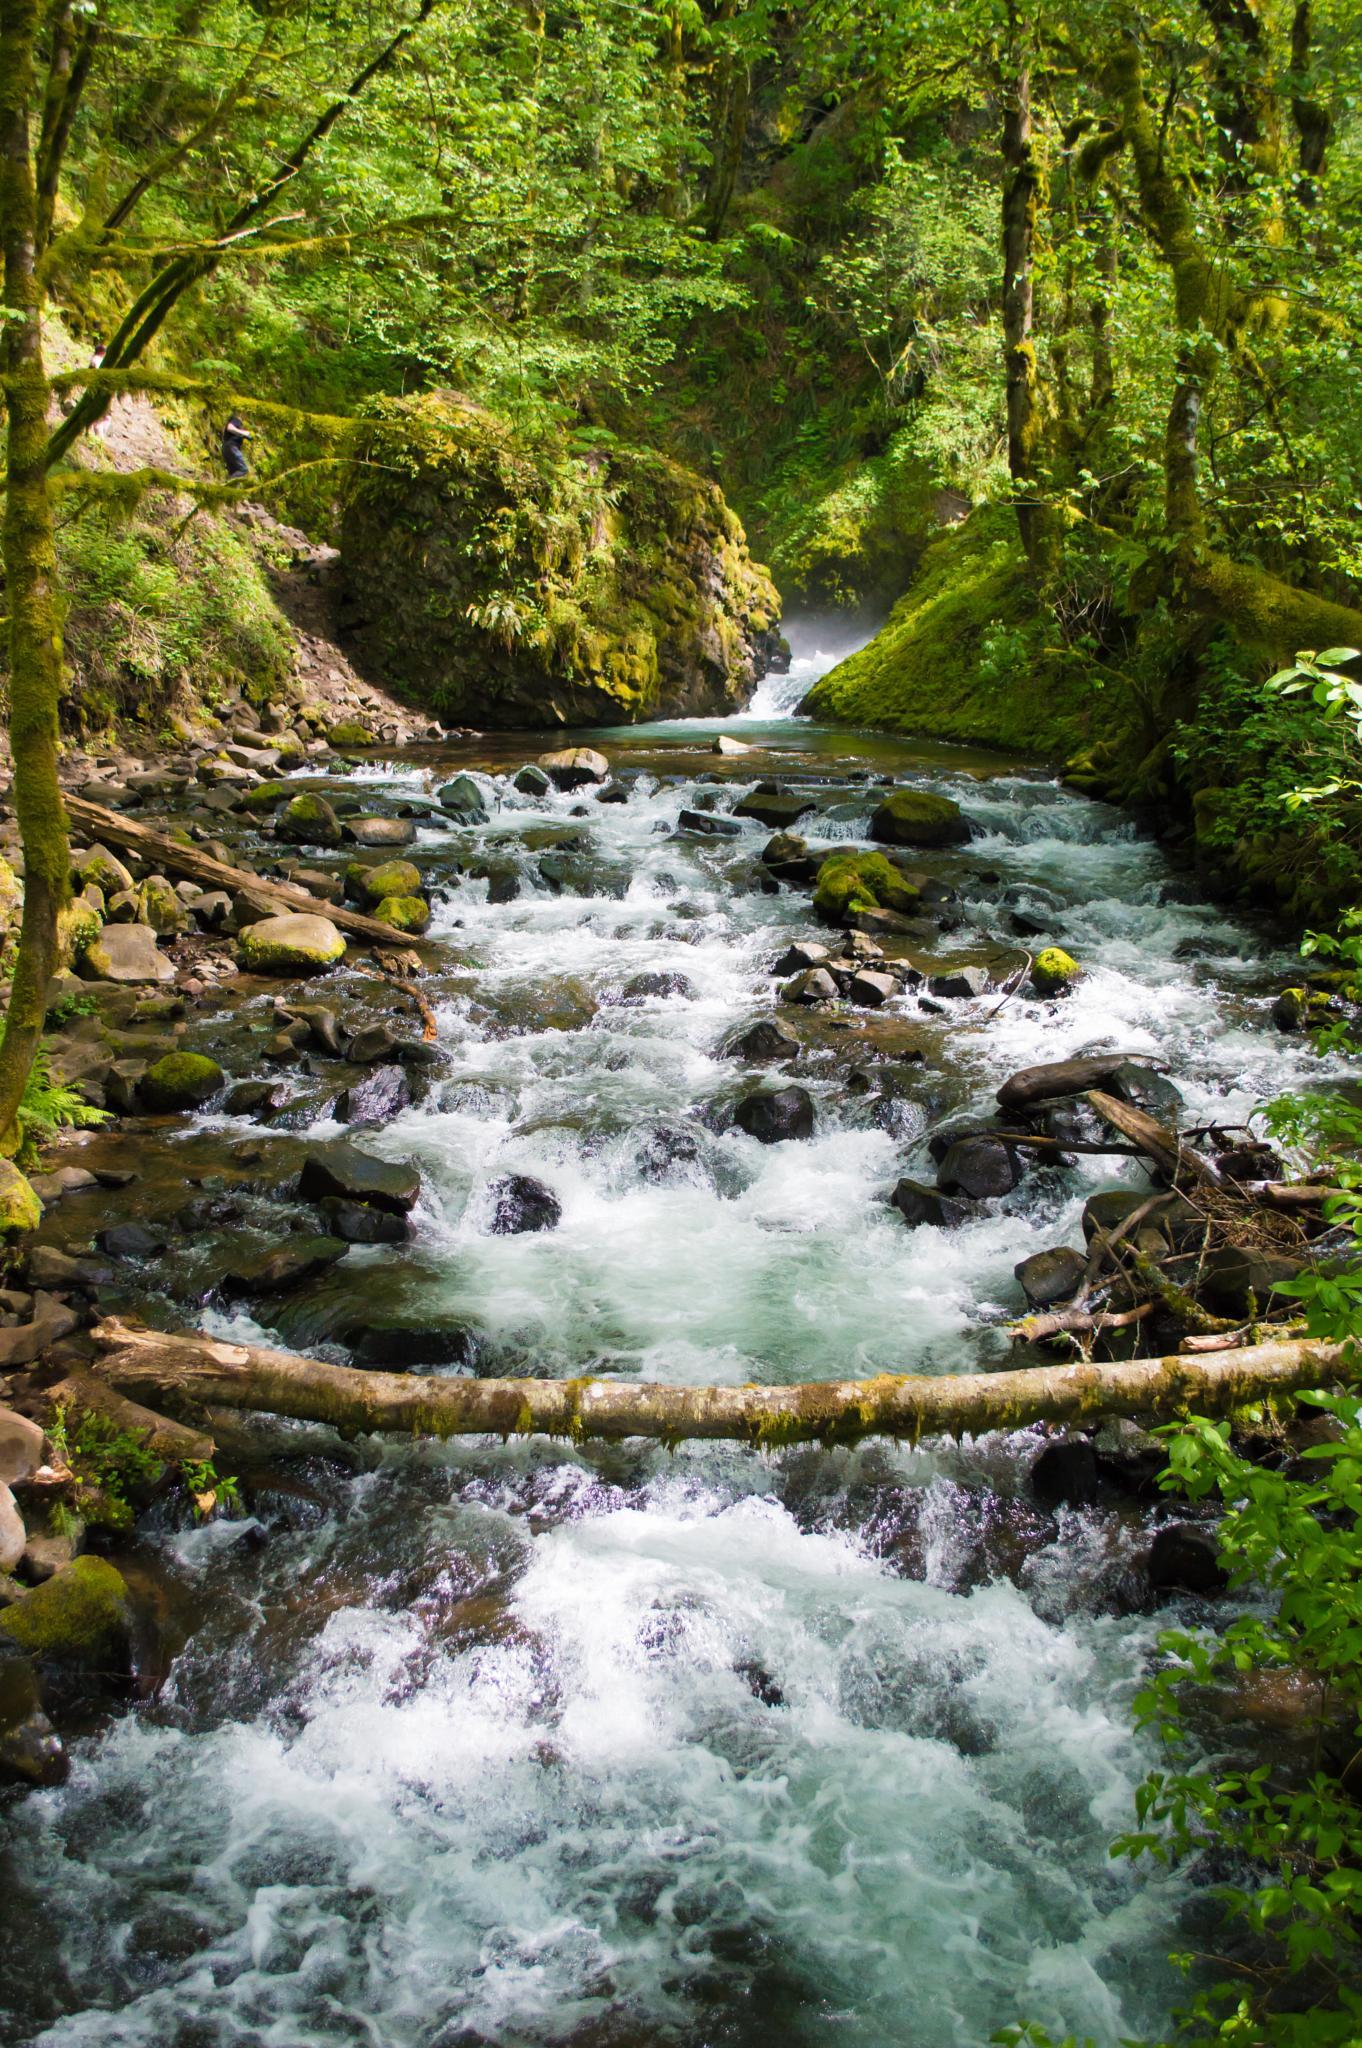 Rushing Stream by Phillip Christilaw